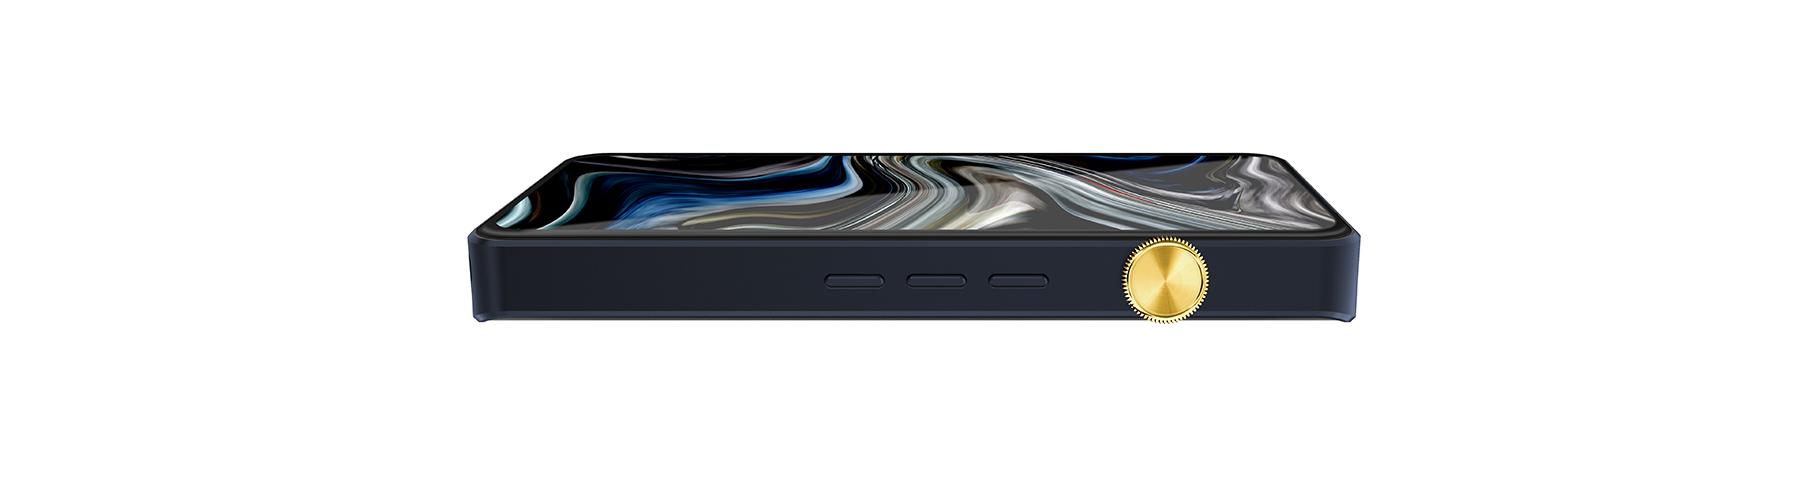 iBasso Audio DX300 Side Profile